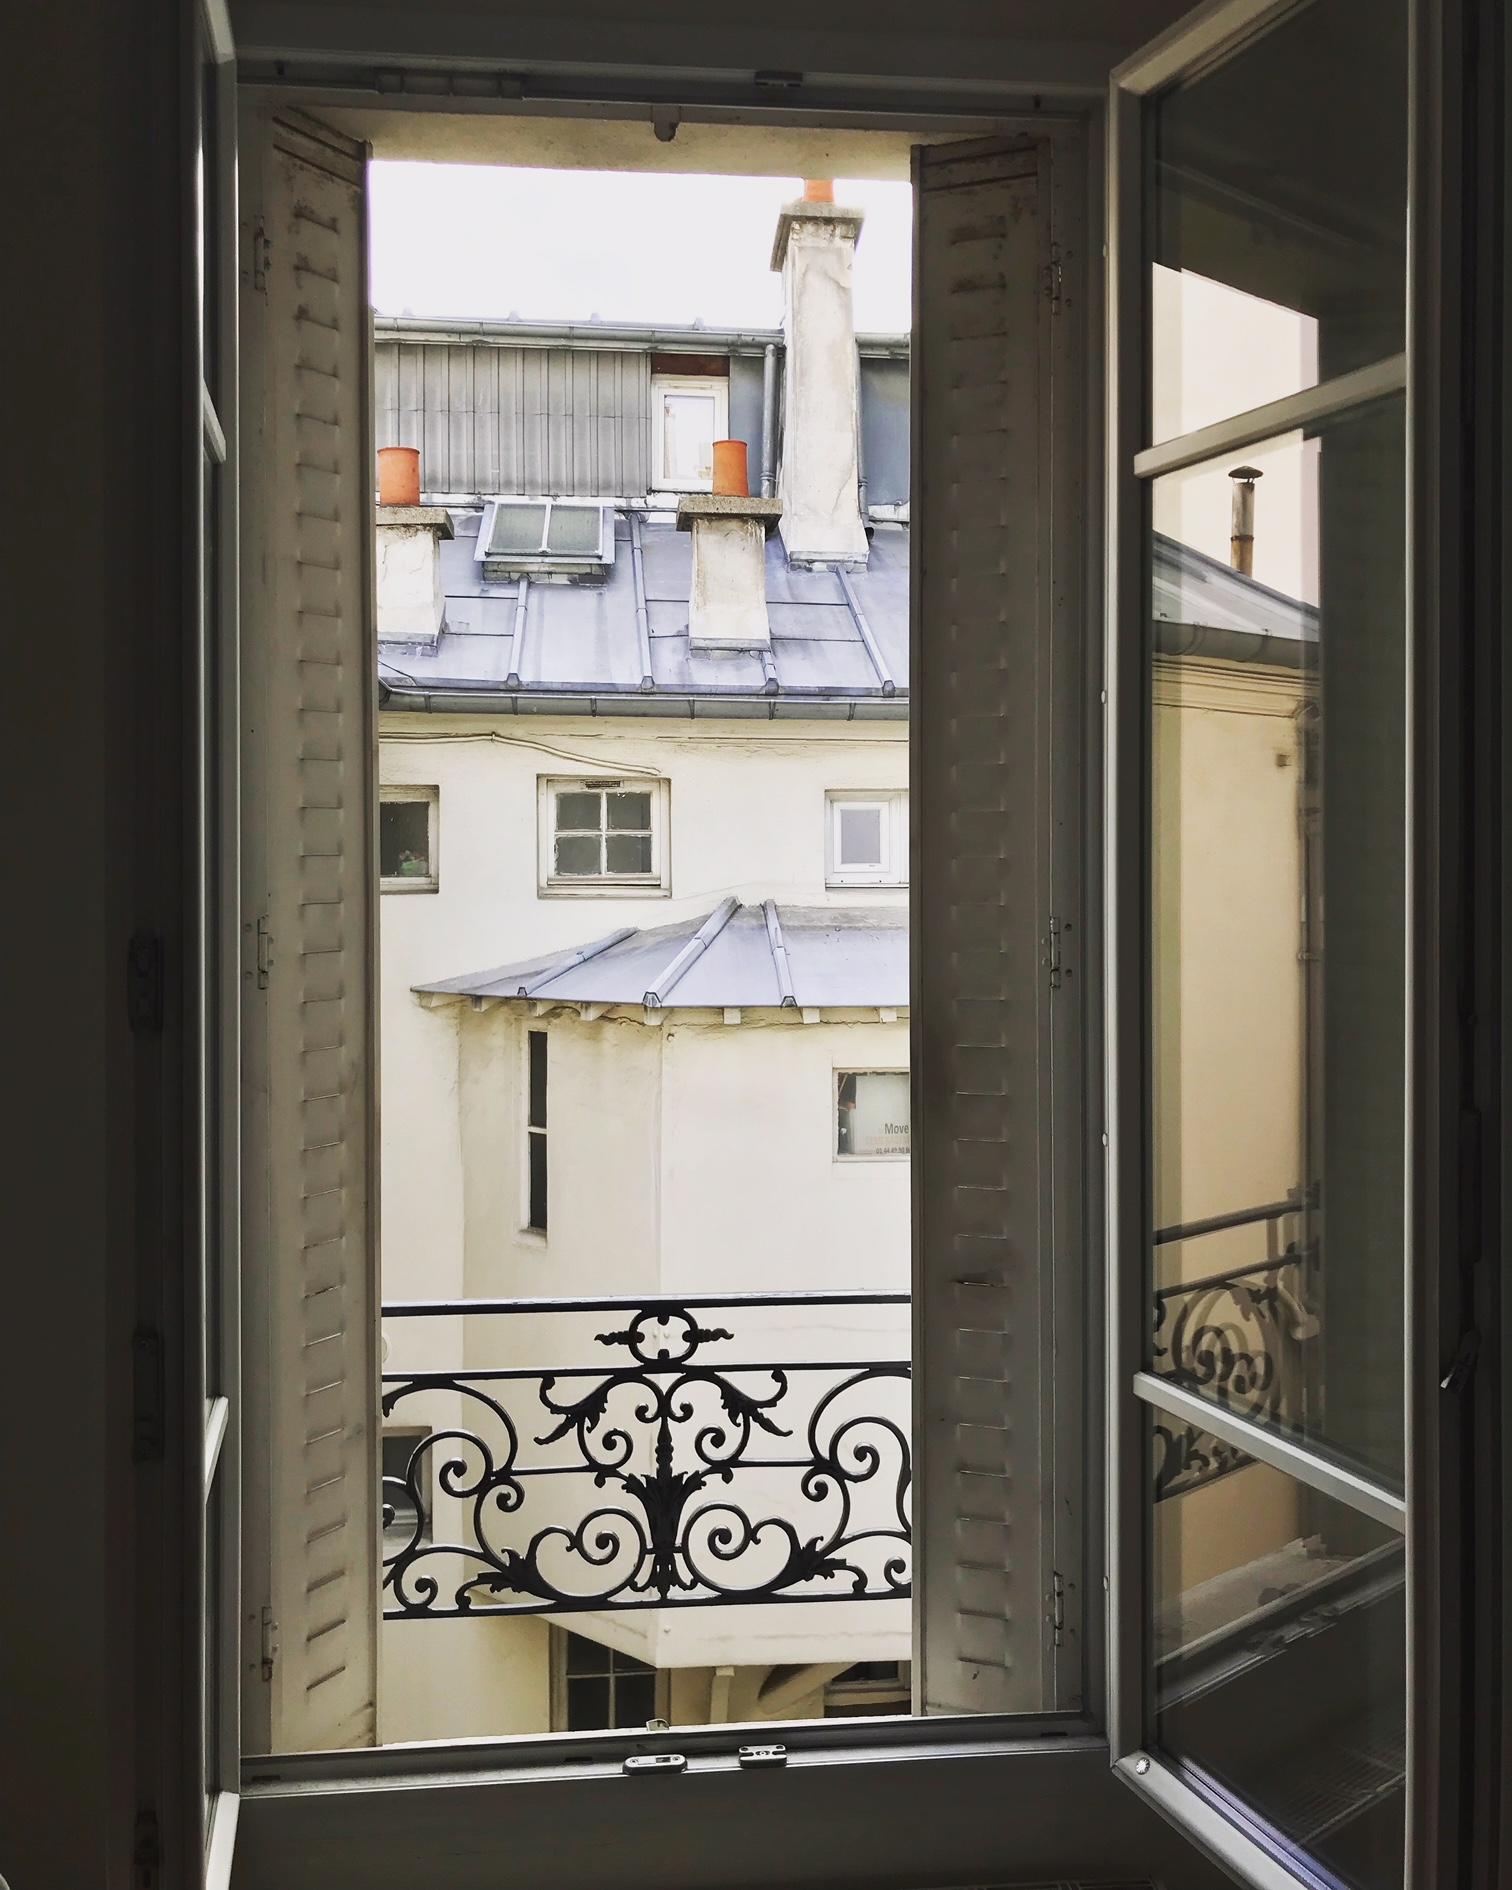 Parisian window